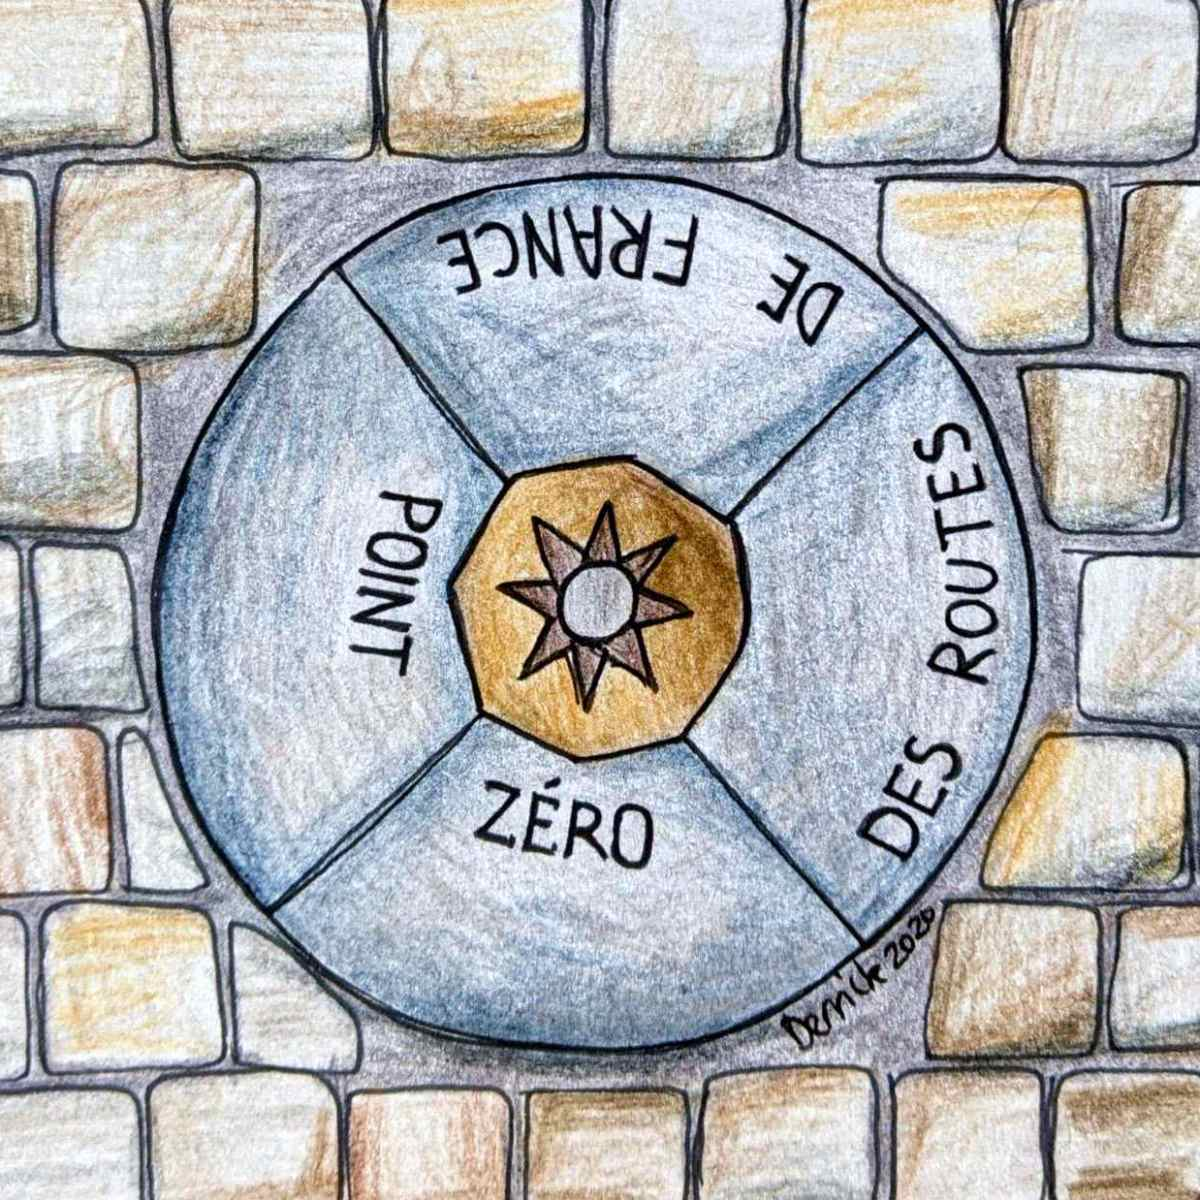 Sketch of the point zero des routes de france bronze marker at the Notre Dame